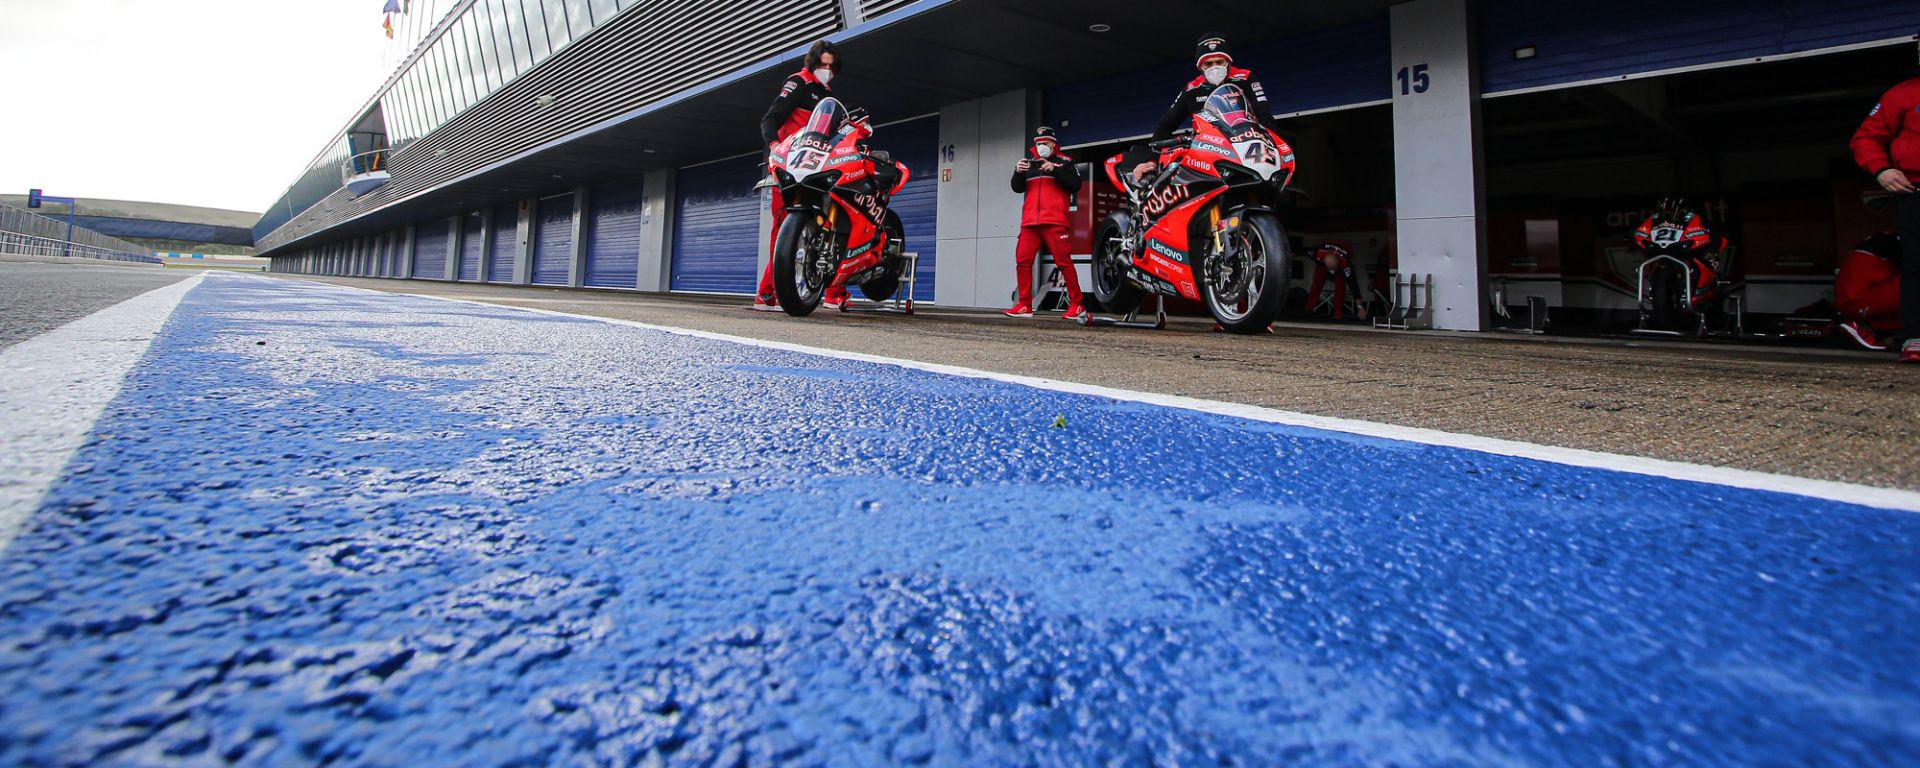 Superbike, il team Ducati Aruba.it ai test di Jerez 2021